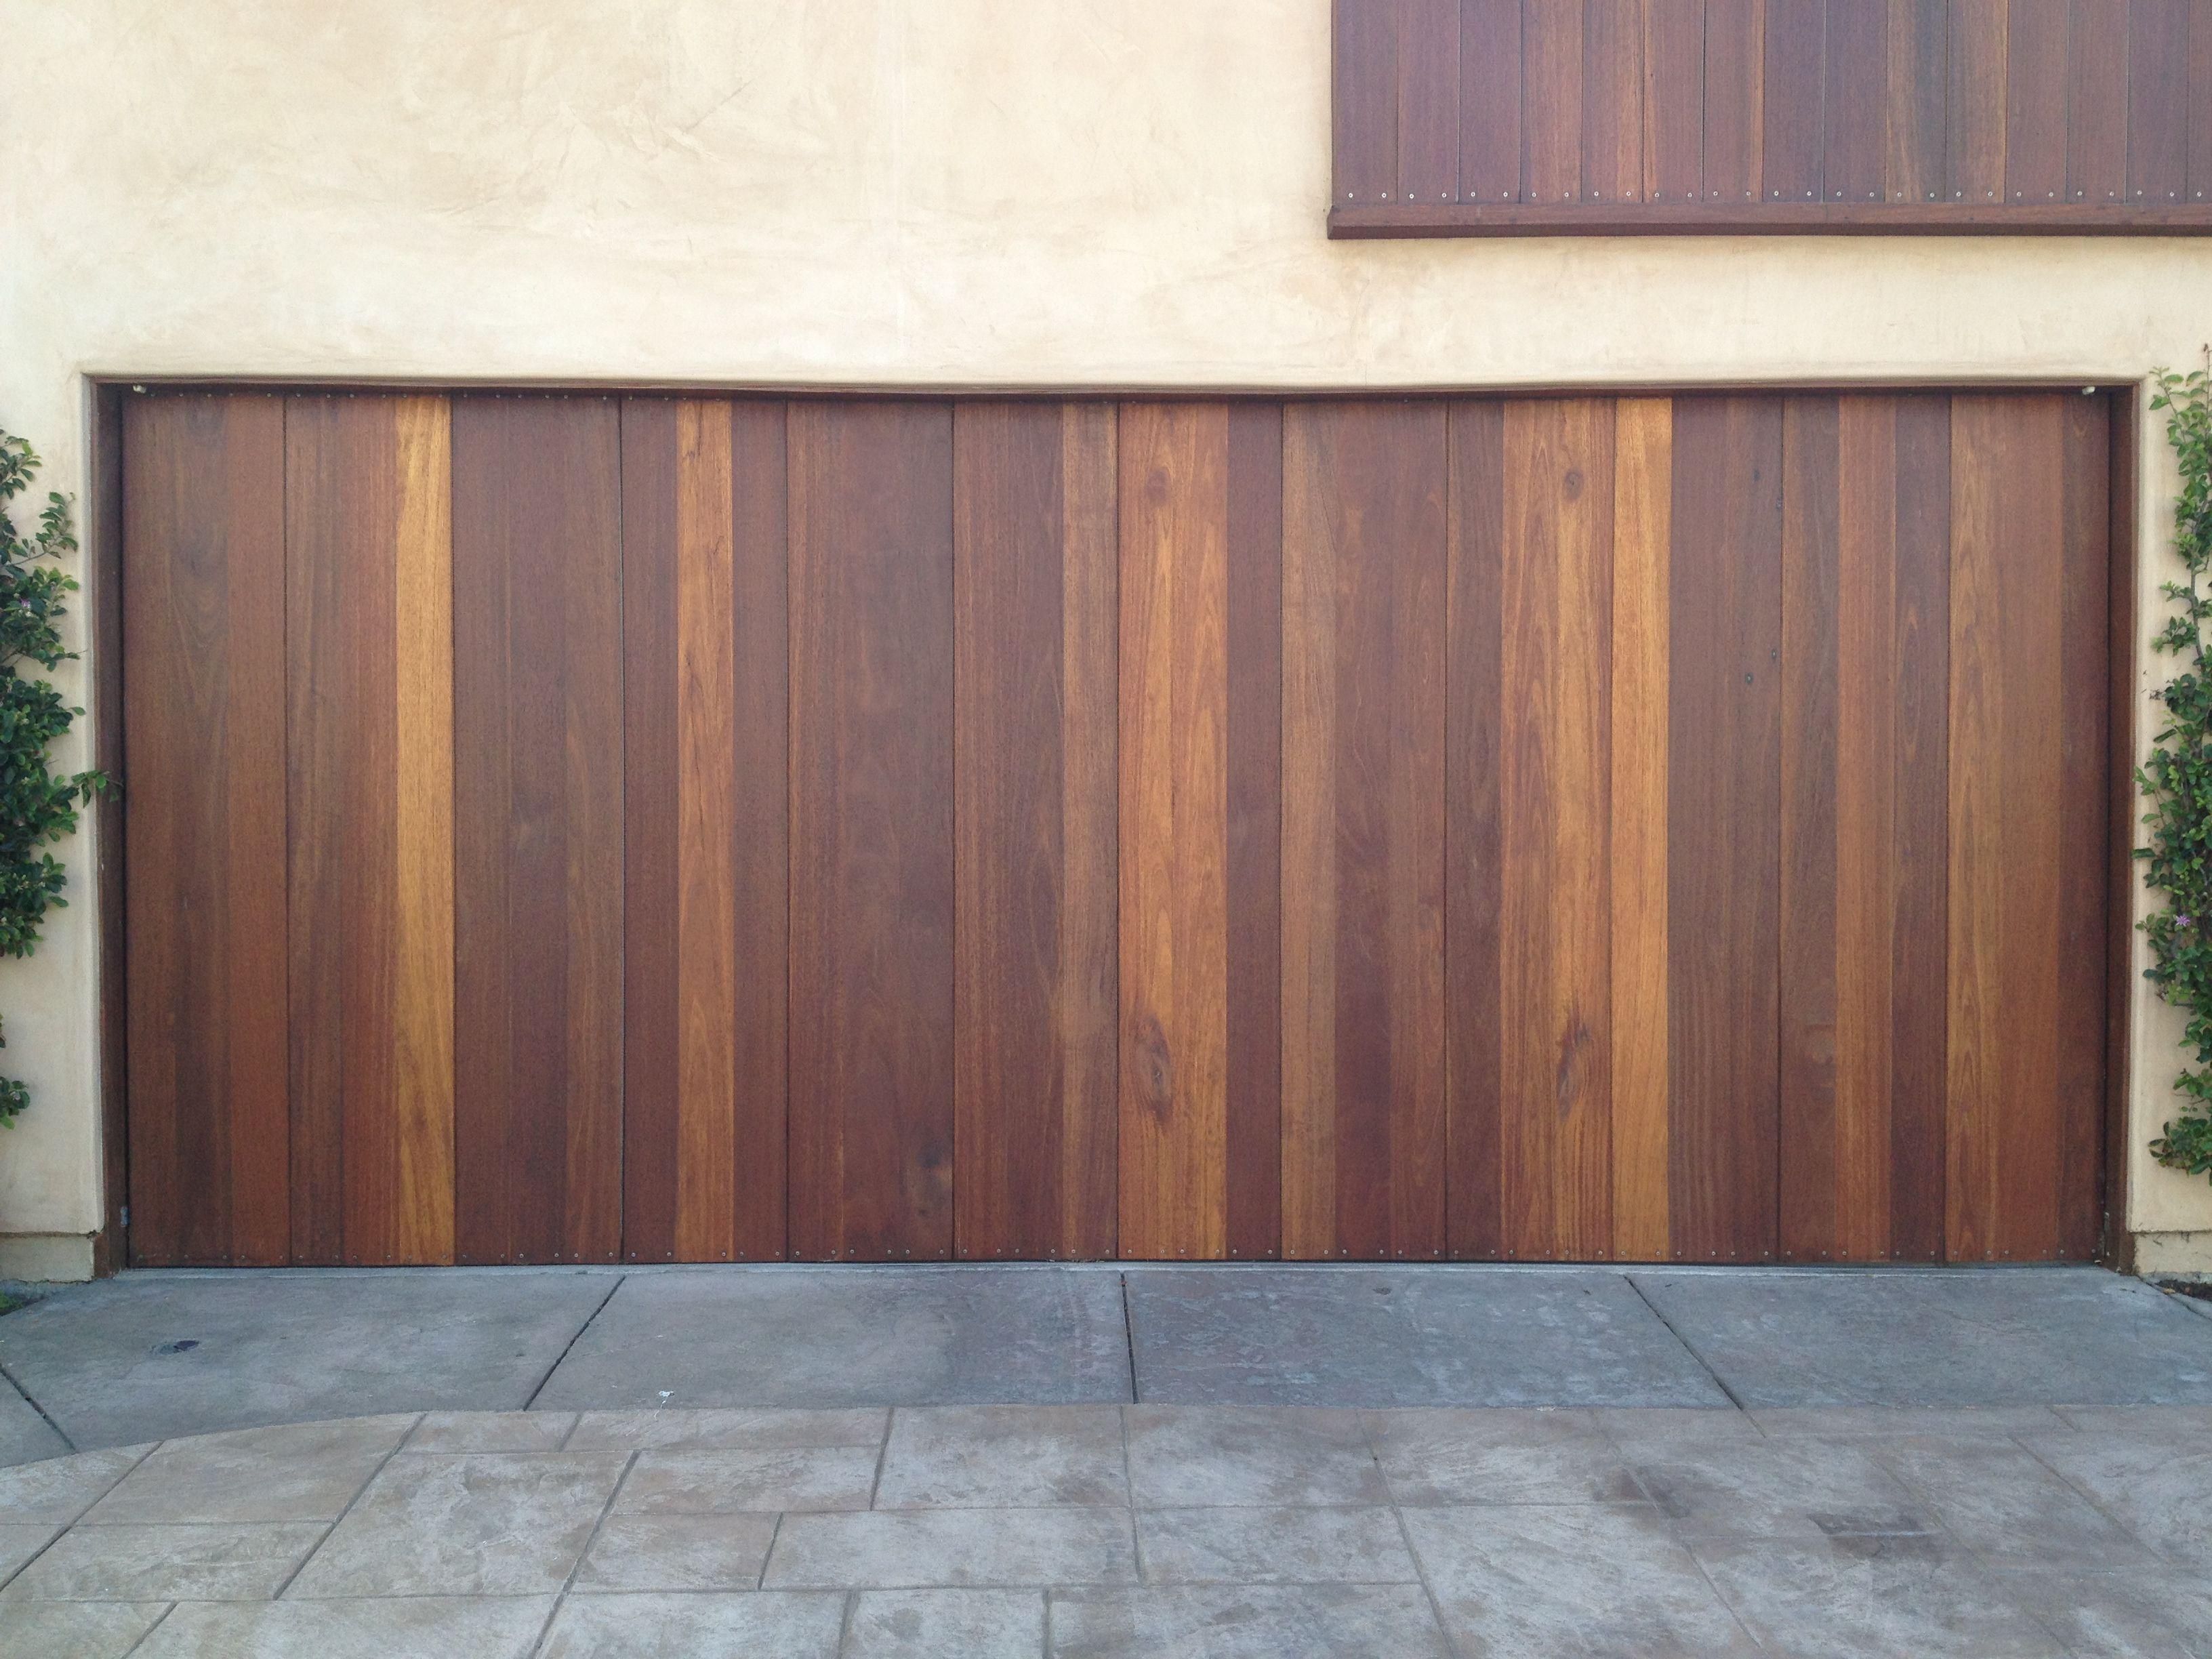 Beautiful Beach Custom Wood Vertical Redwood Garage Door Los Angeles Ca Photo Credit Agi Dyer Ga Contemporary Garage Doors Modern Garage Doors Garage Doors